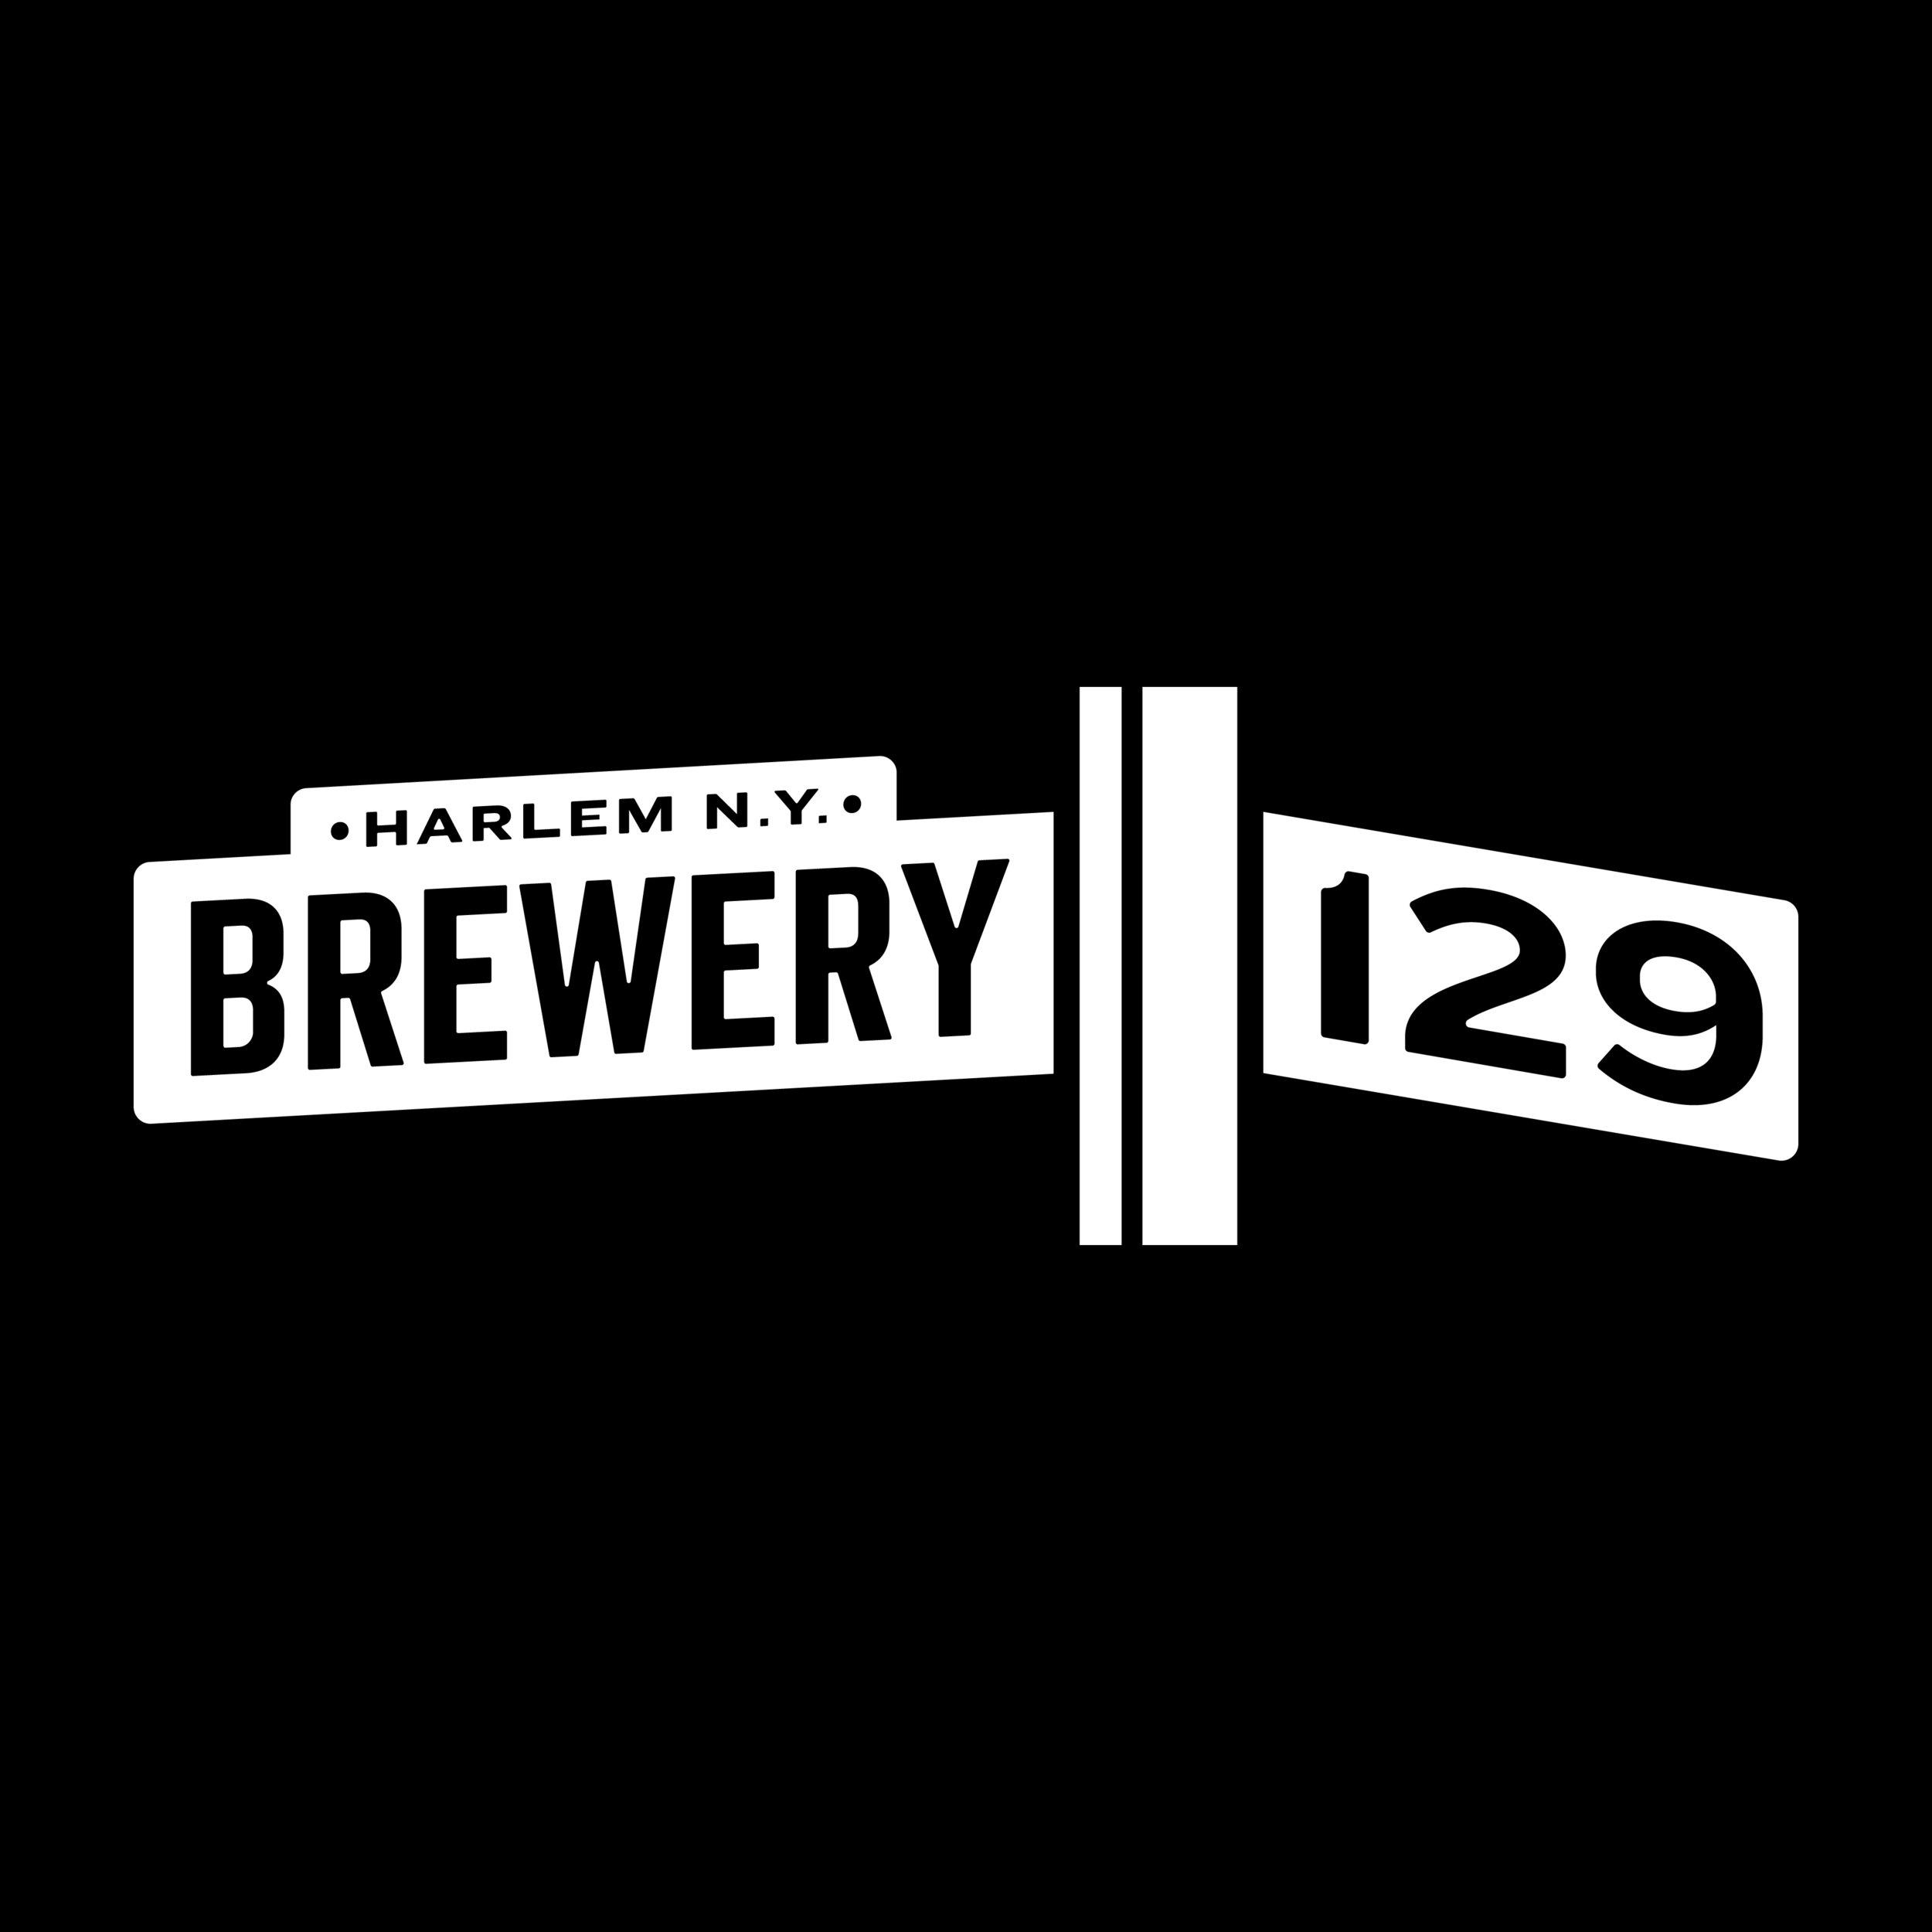 Brewery129 Logos-01.jpg